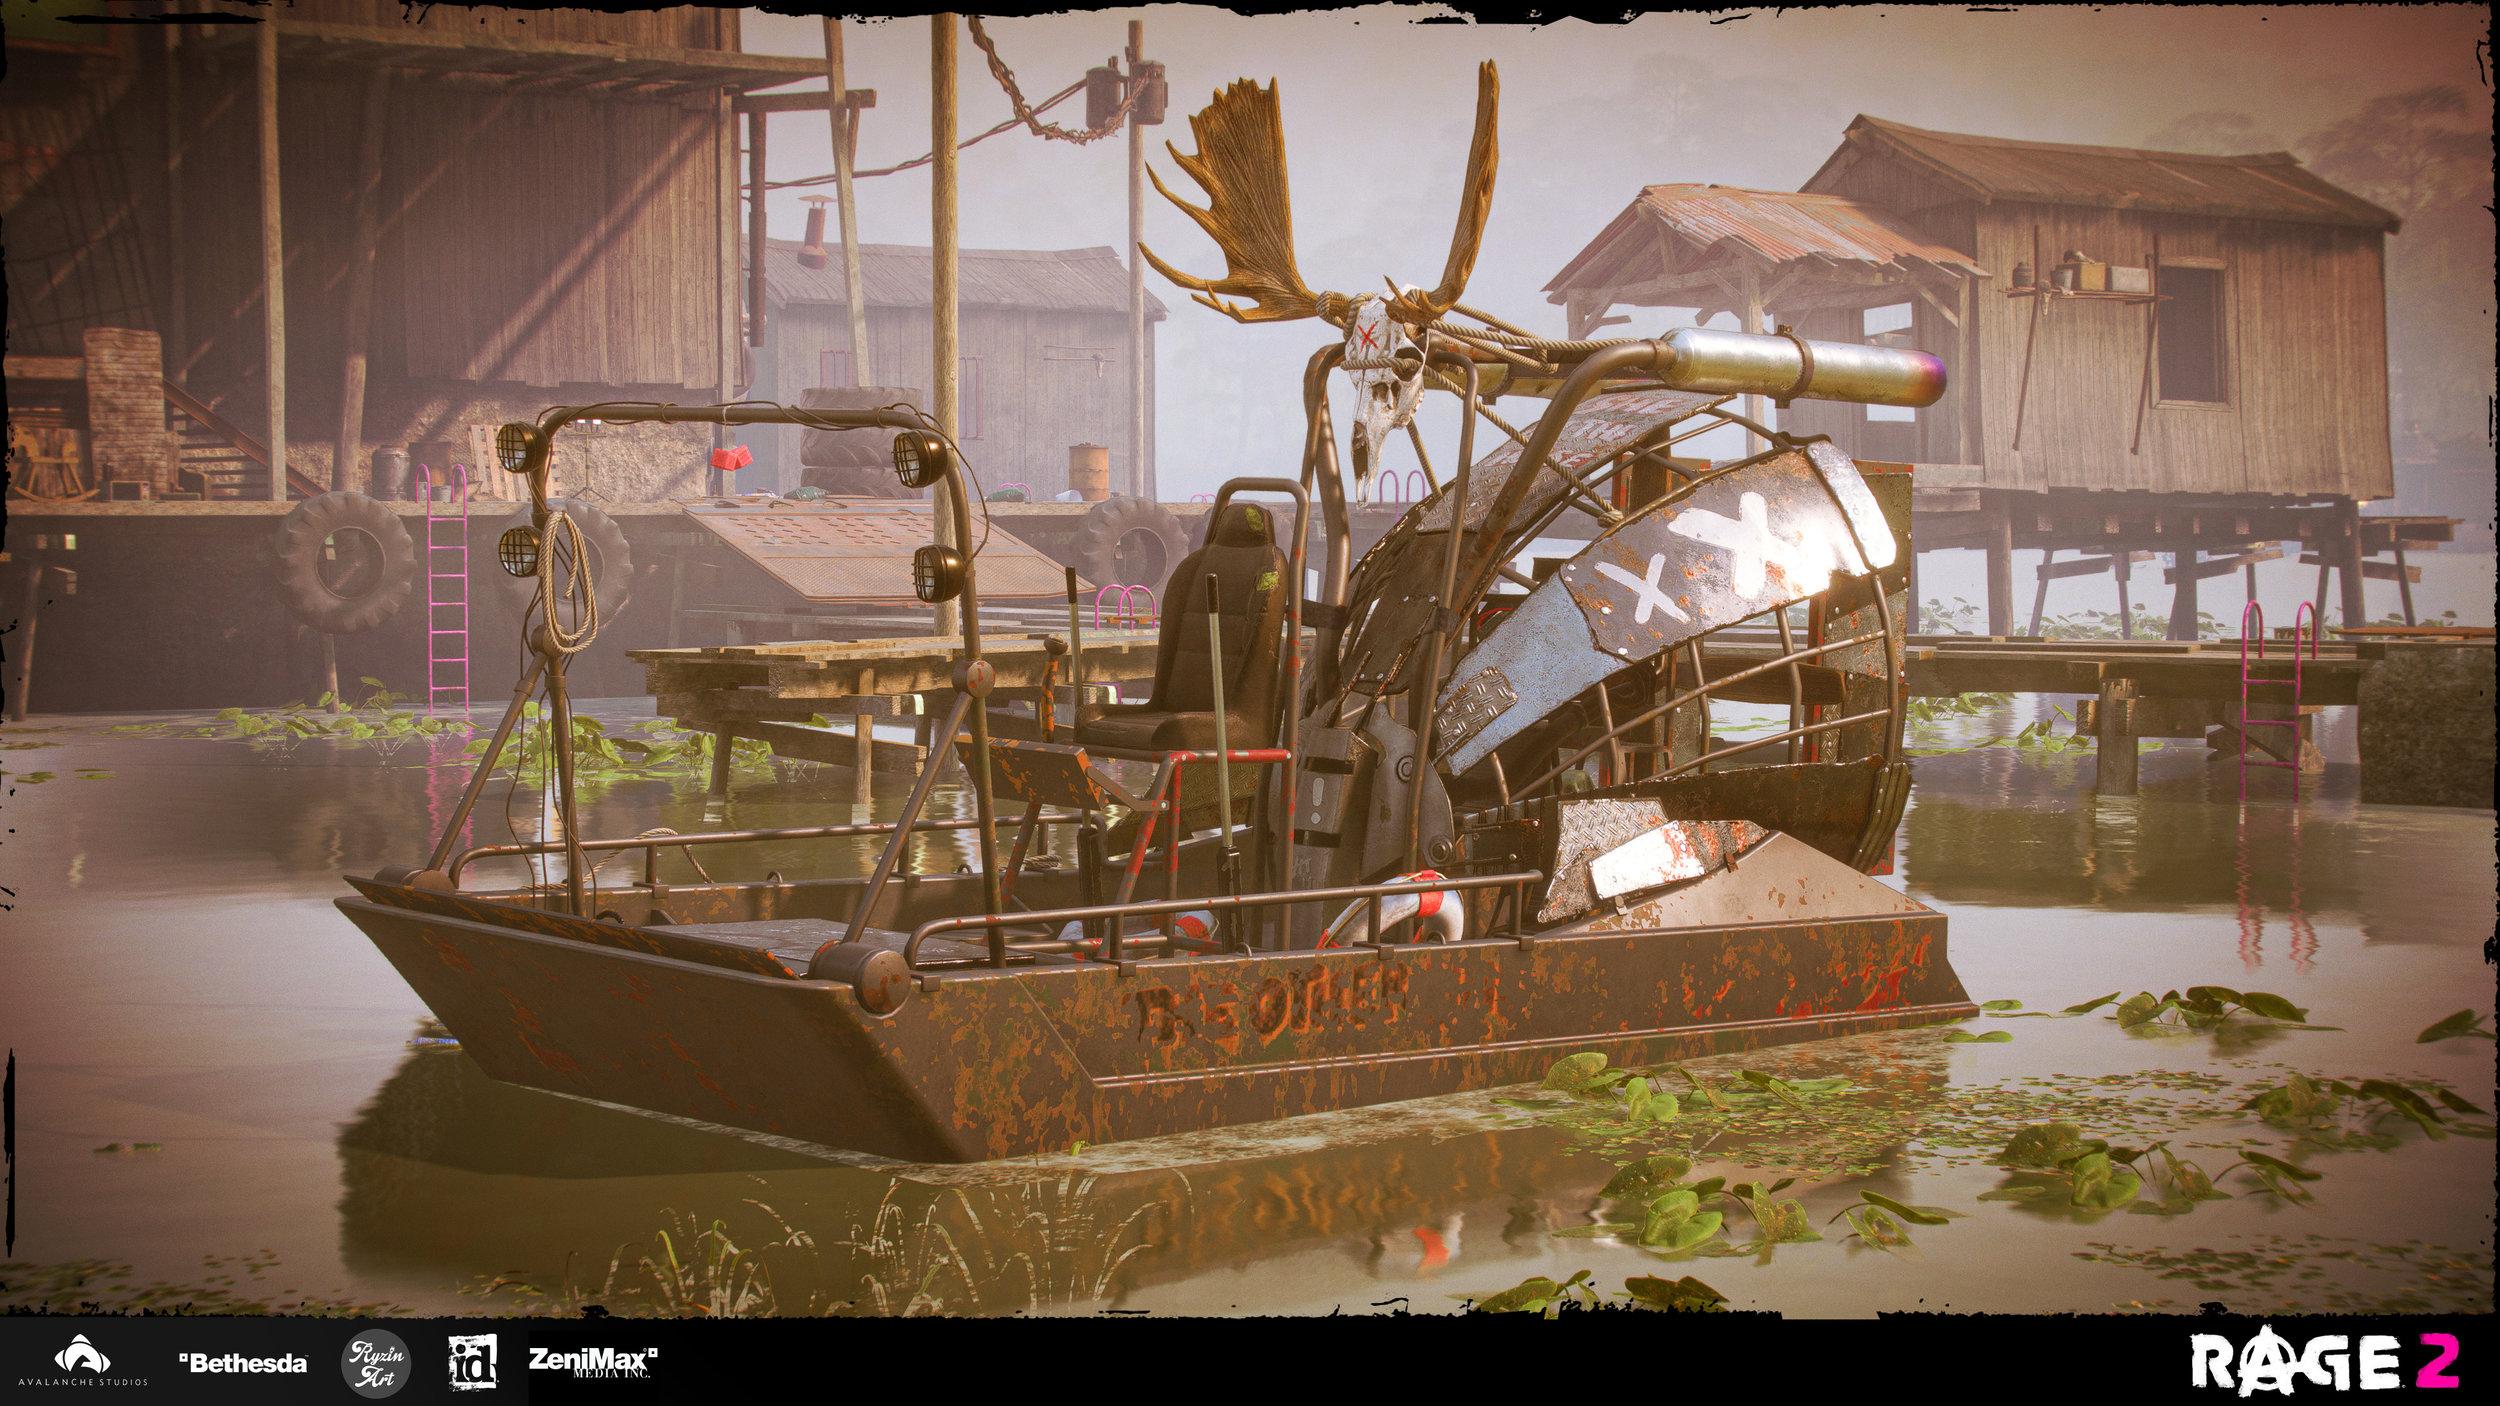 Boat_04.jpg